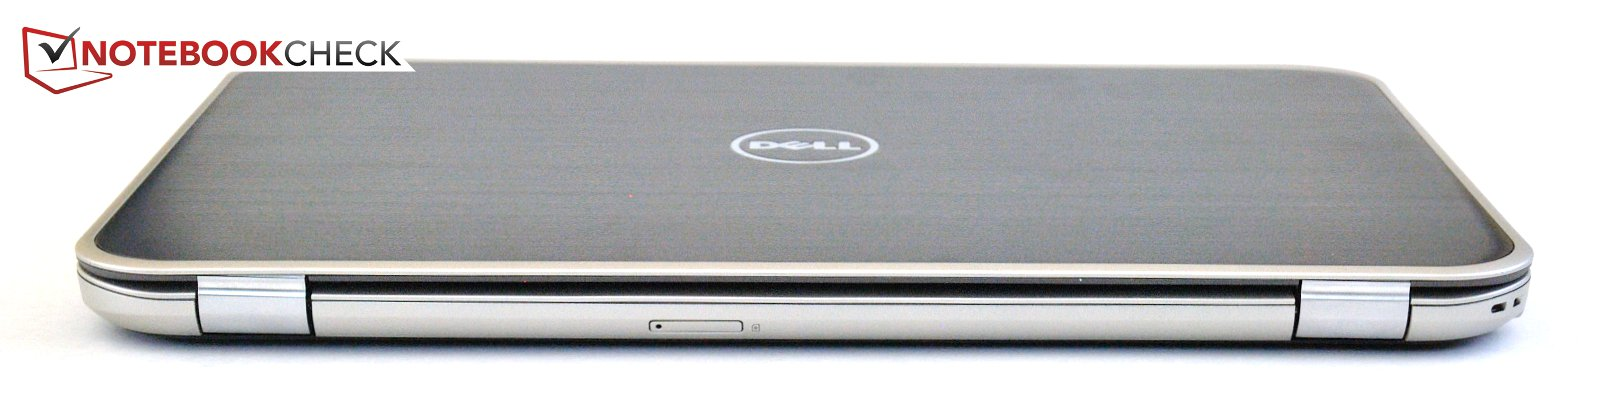 Dell Inspiron 14Z 5423 Notebook ATI Radeon HD 7570M Display Drivers PC